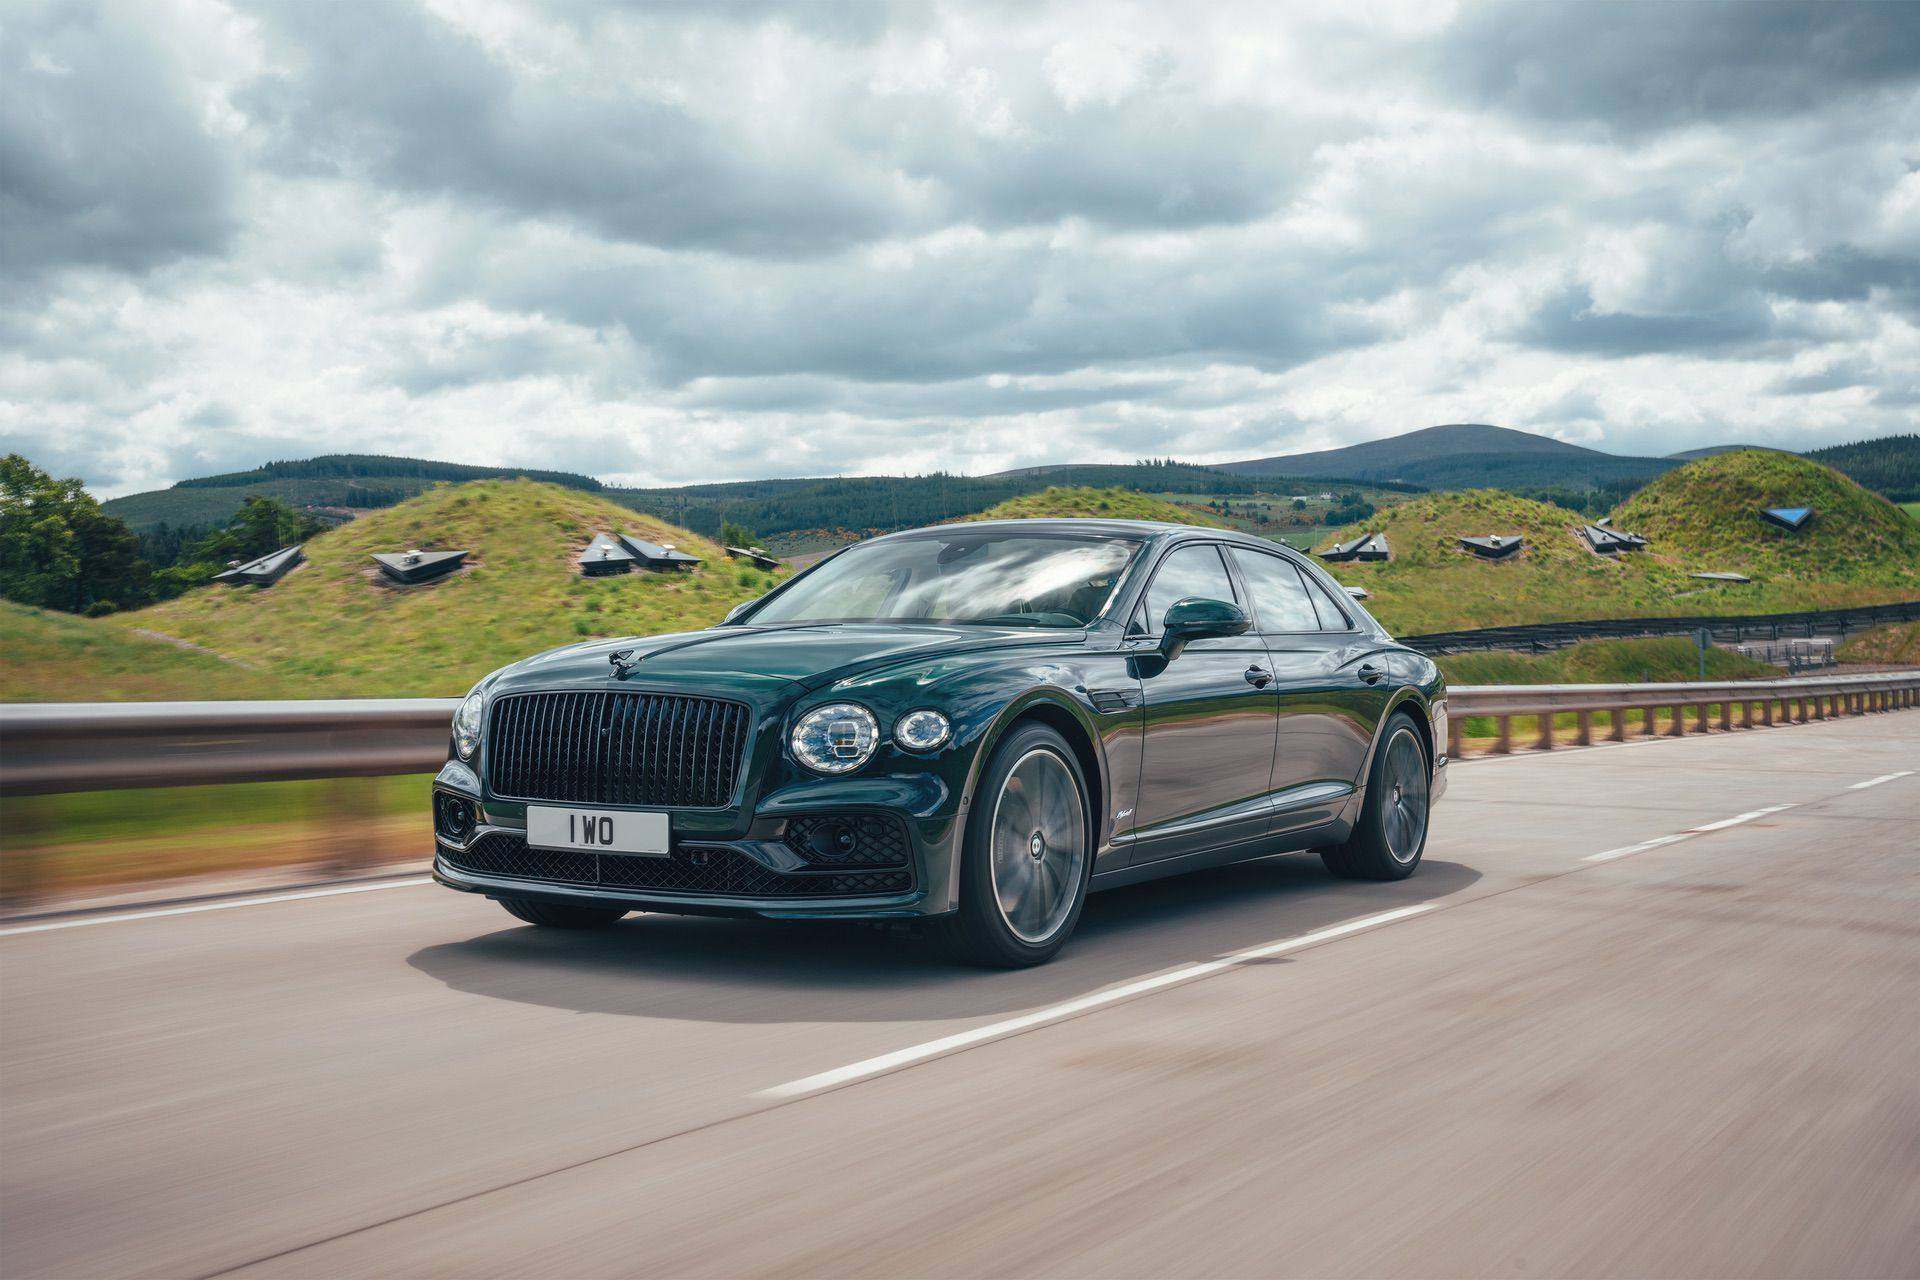 2022_Bentley_Flying_Spur_Hybrid-0002